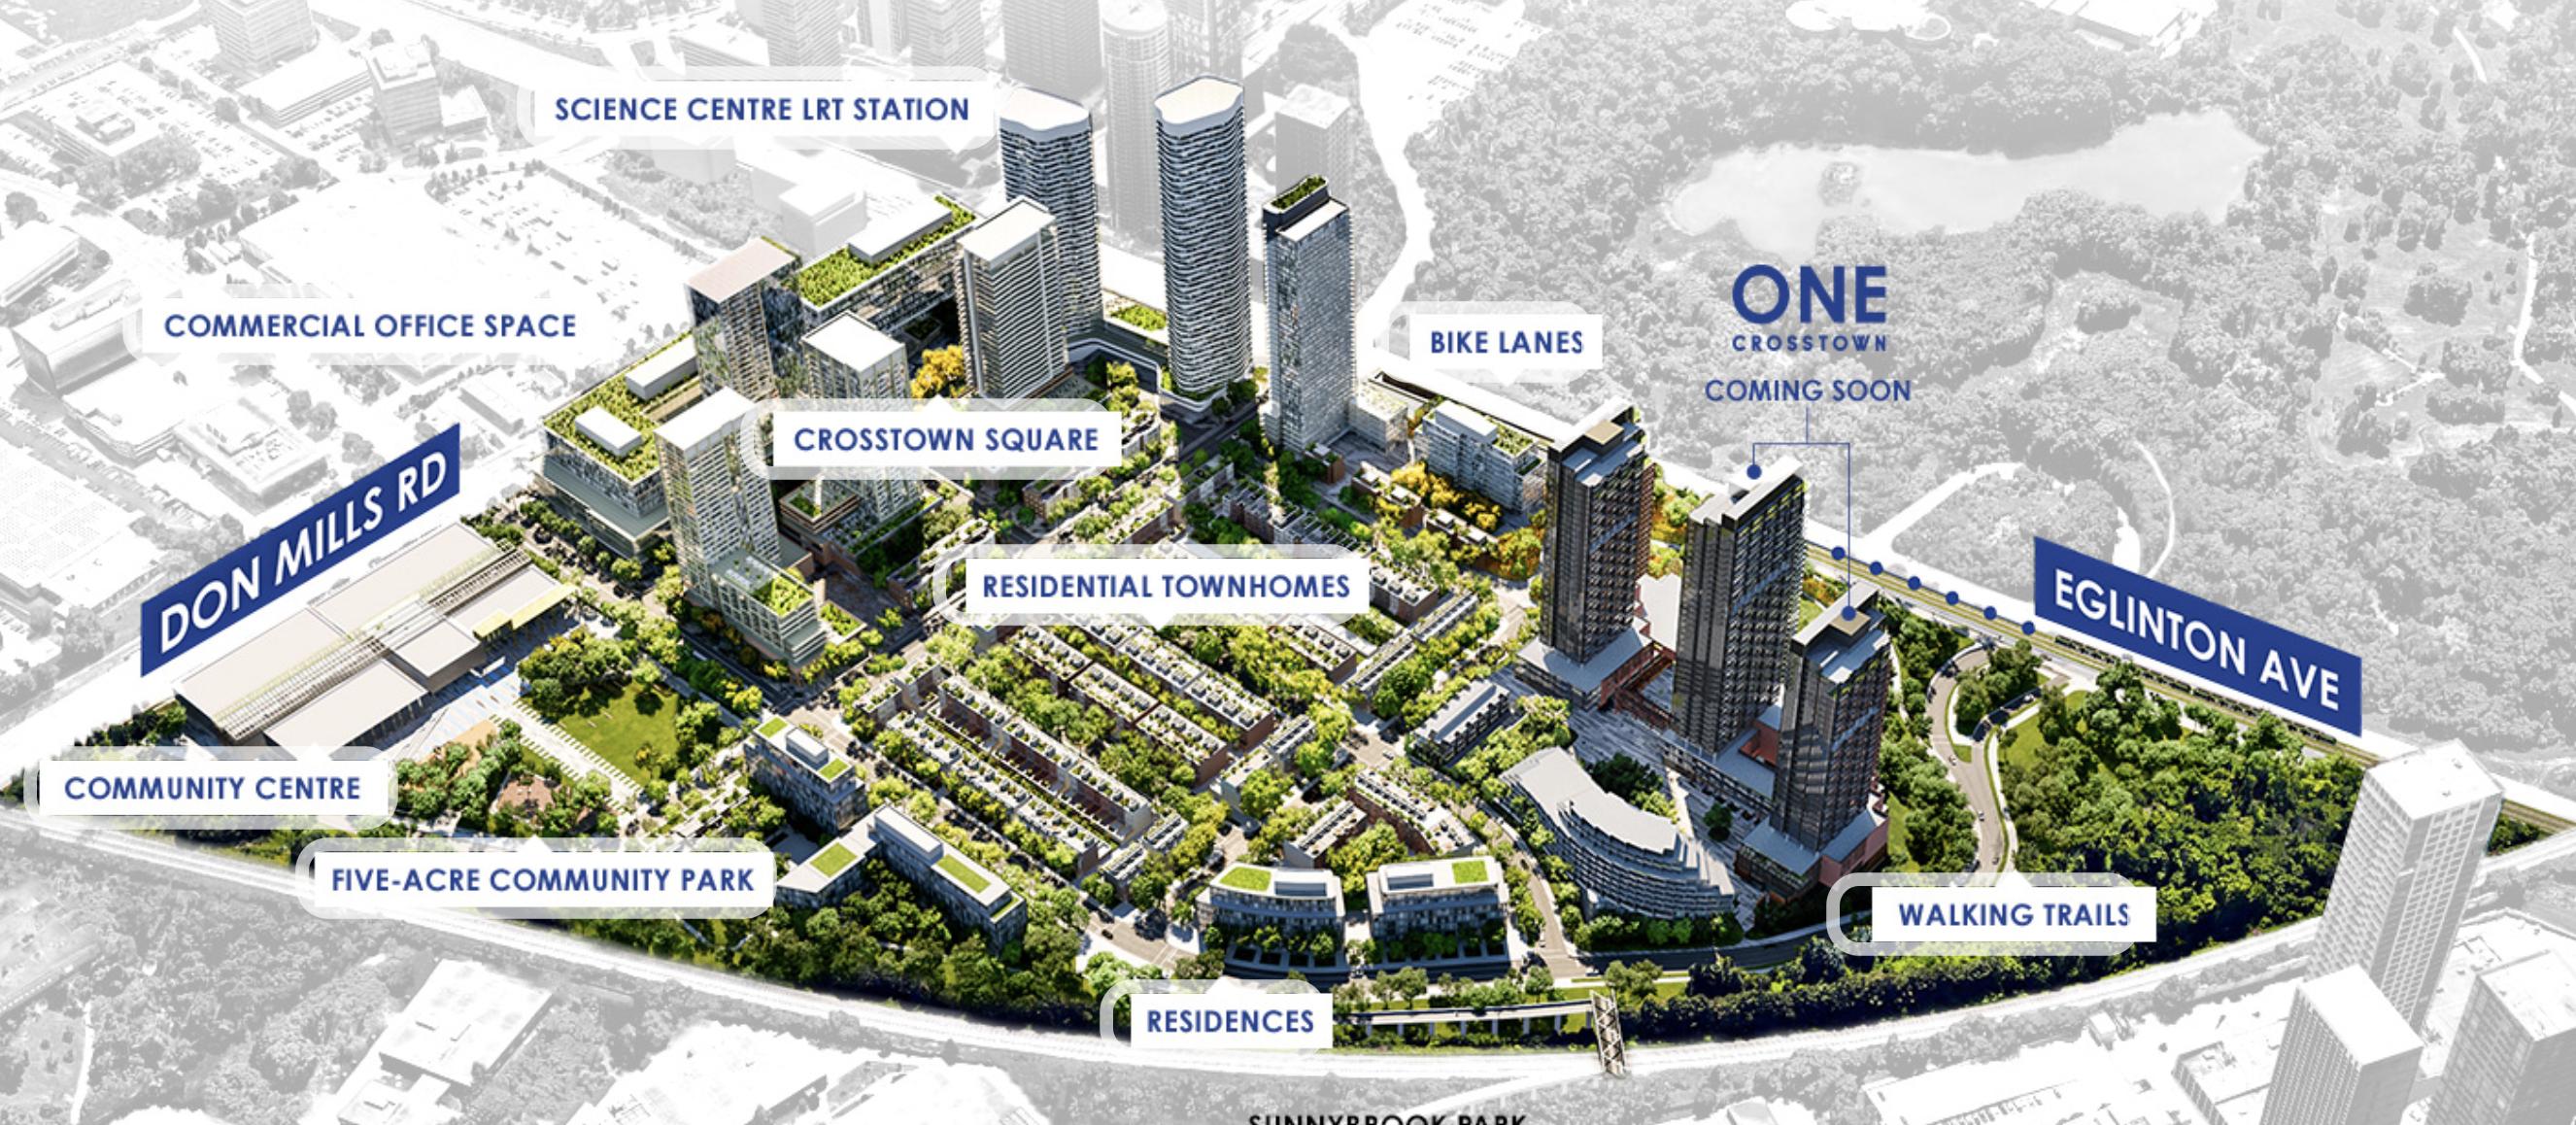 Toronto developer plans 60 acre mixed-use development at former IBM